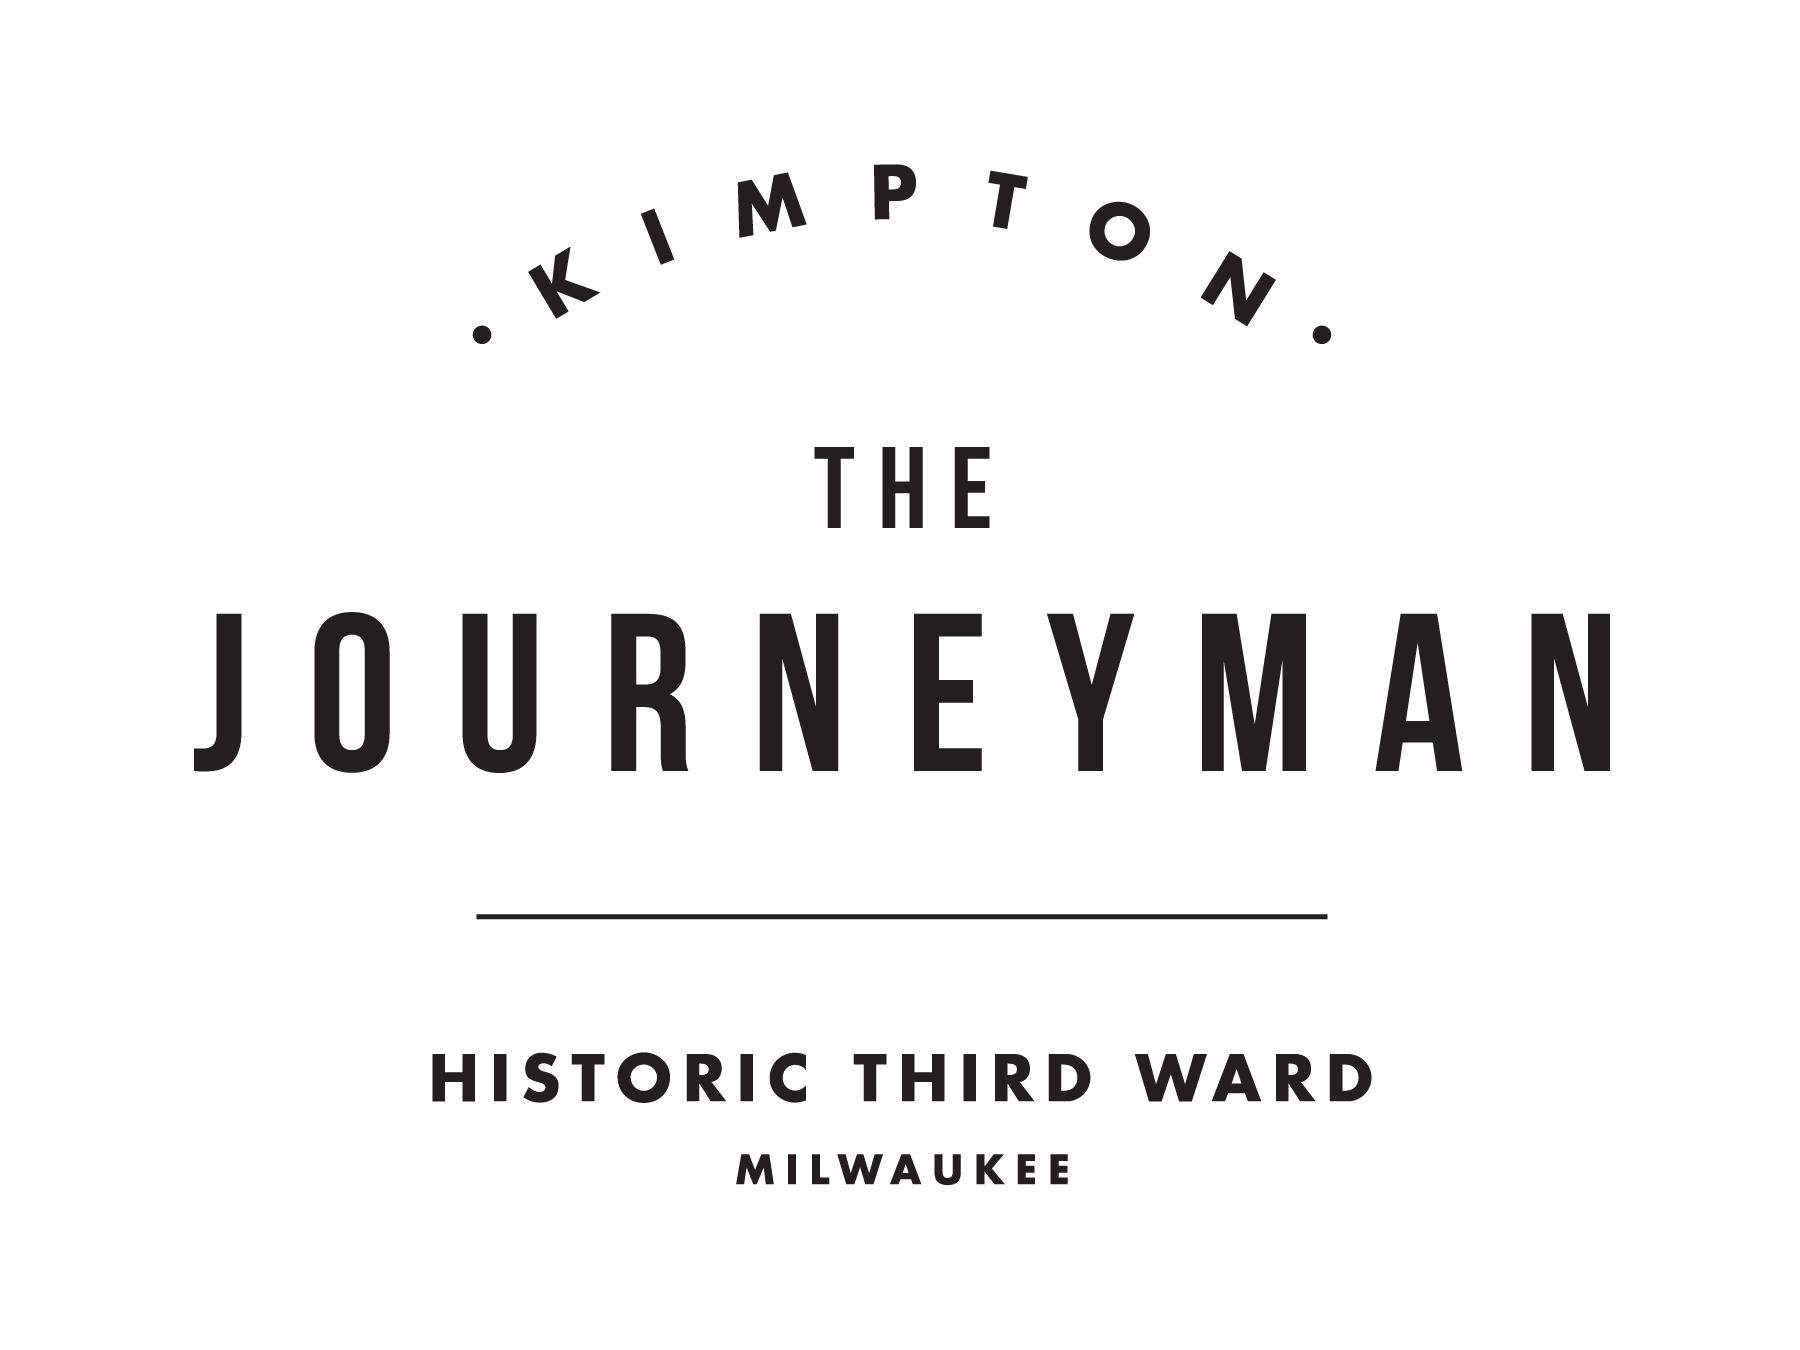 The_Journeyman_logo_simplified_K.jpg